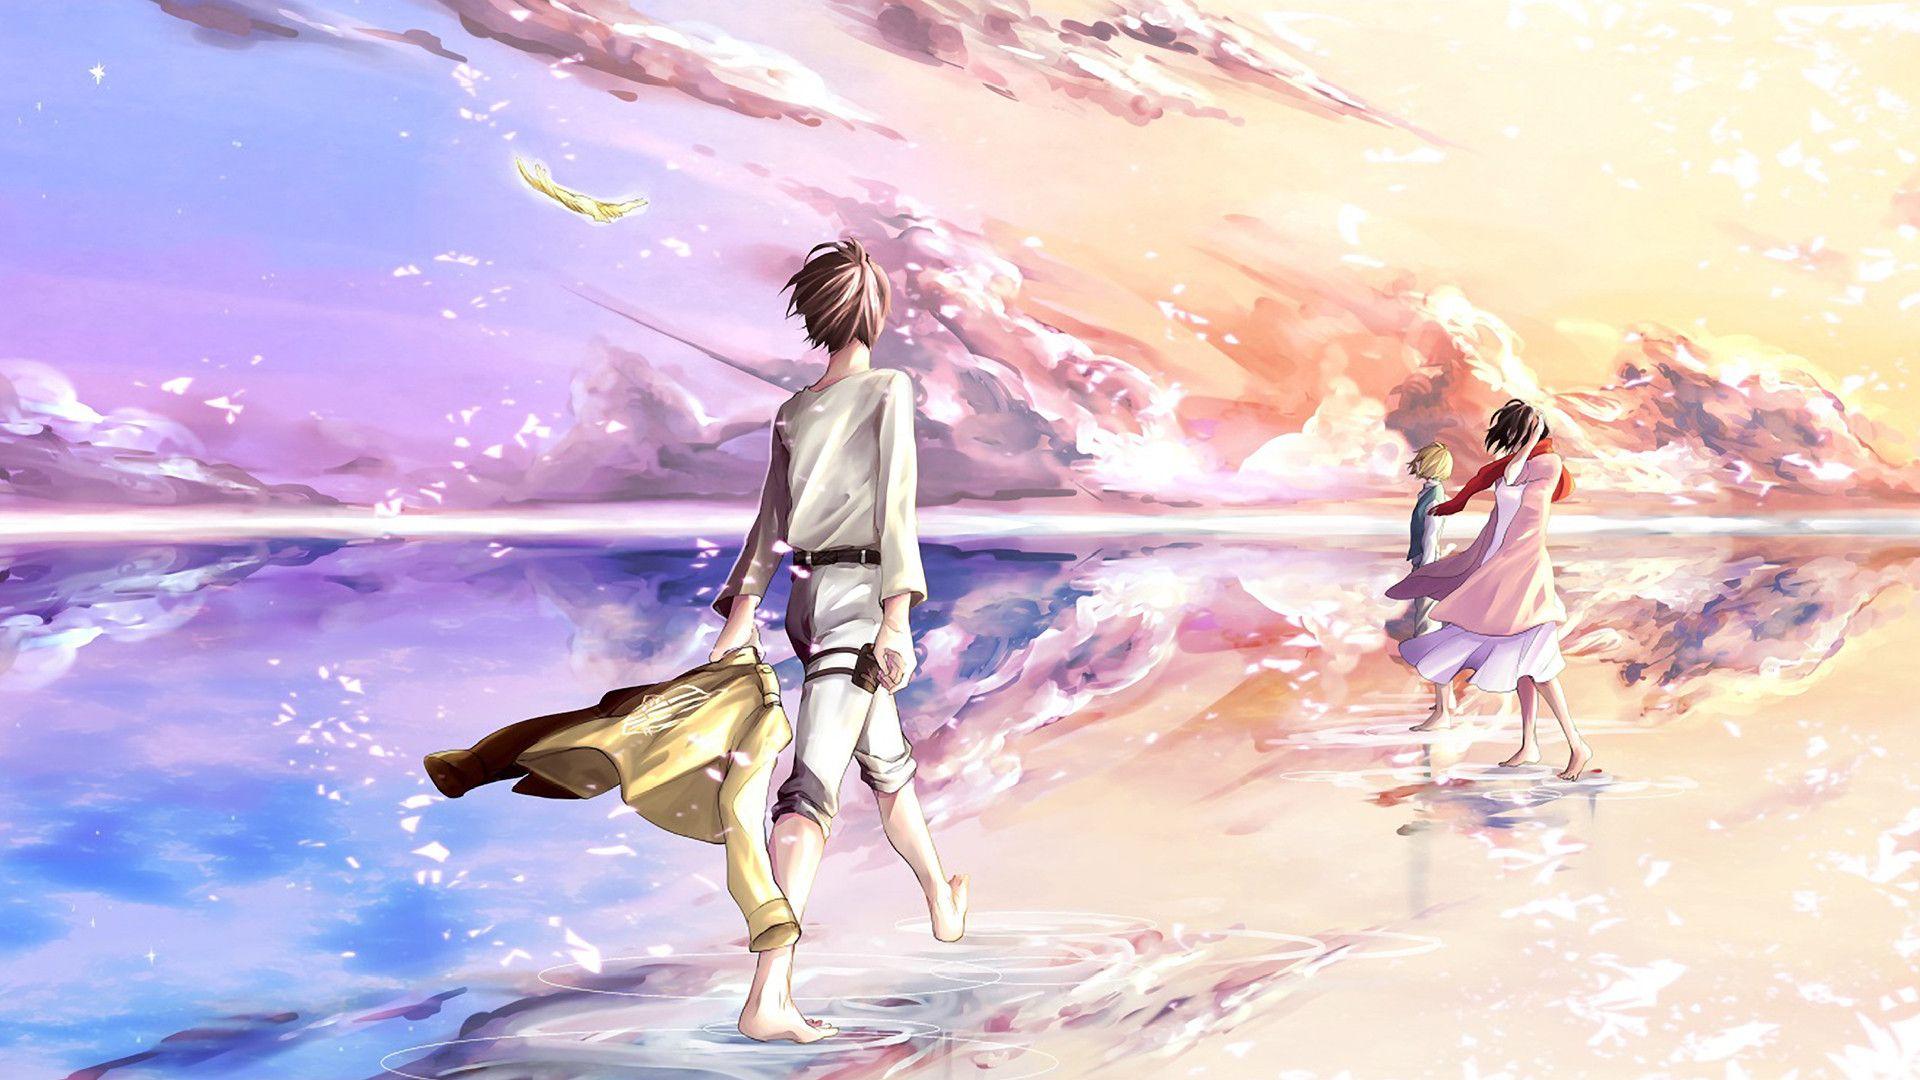 Shingeki No Kyojin Fanart Wallpaper Pastel Cloudy Skies Eren Armin Mikasa Attack On Titan Attack On Titan Eren Attack On Titan Levi